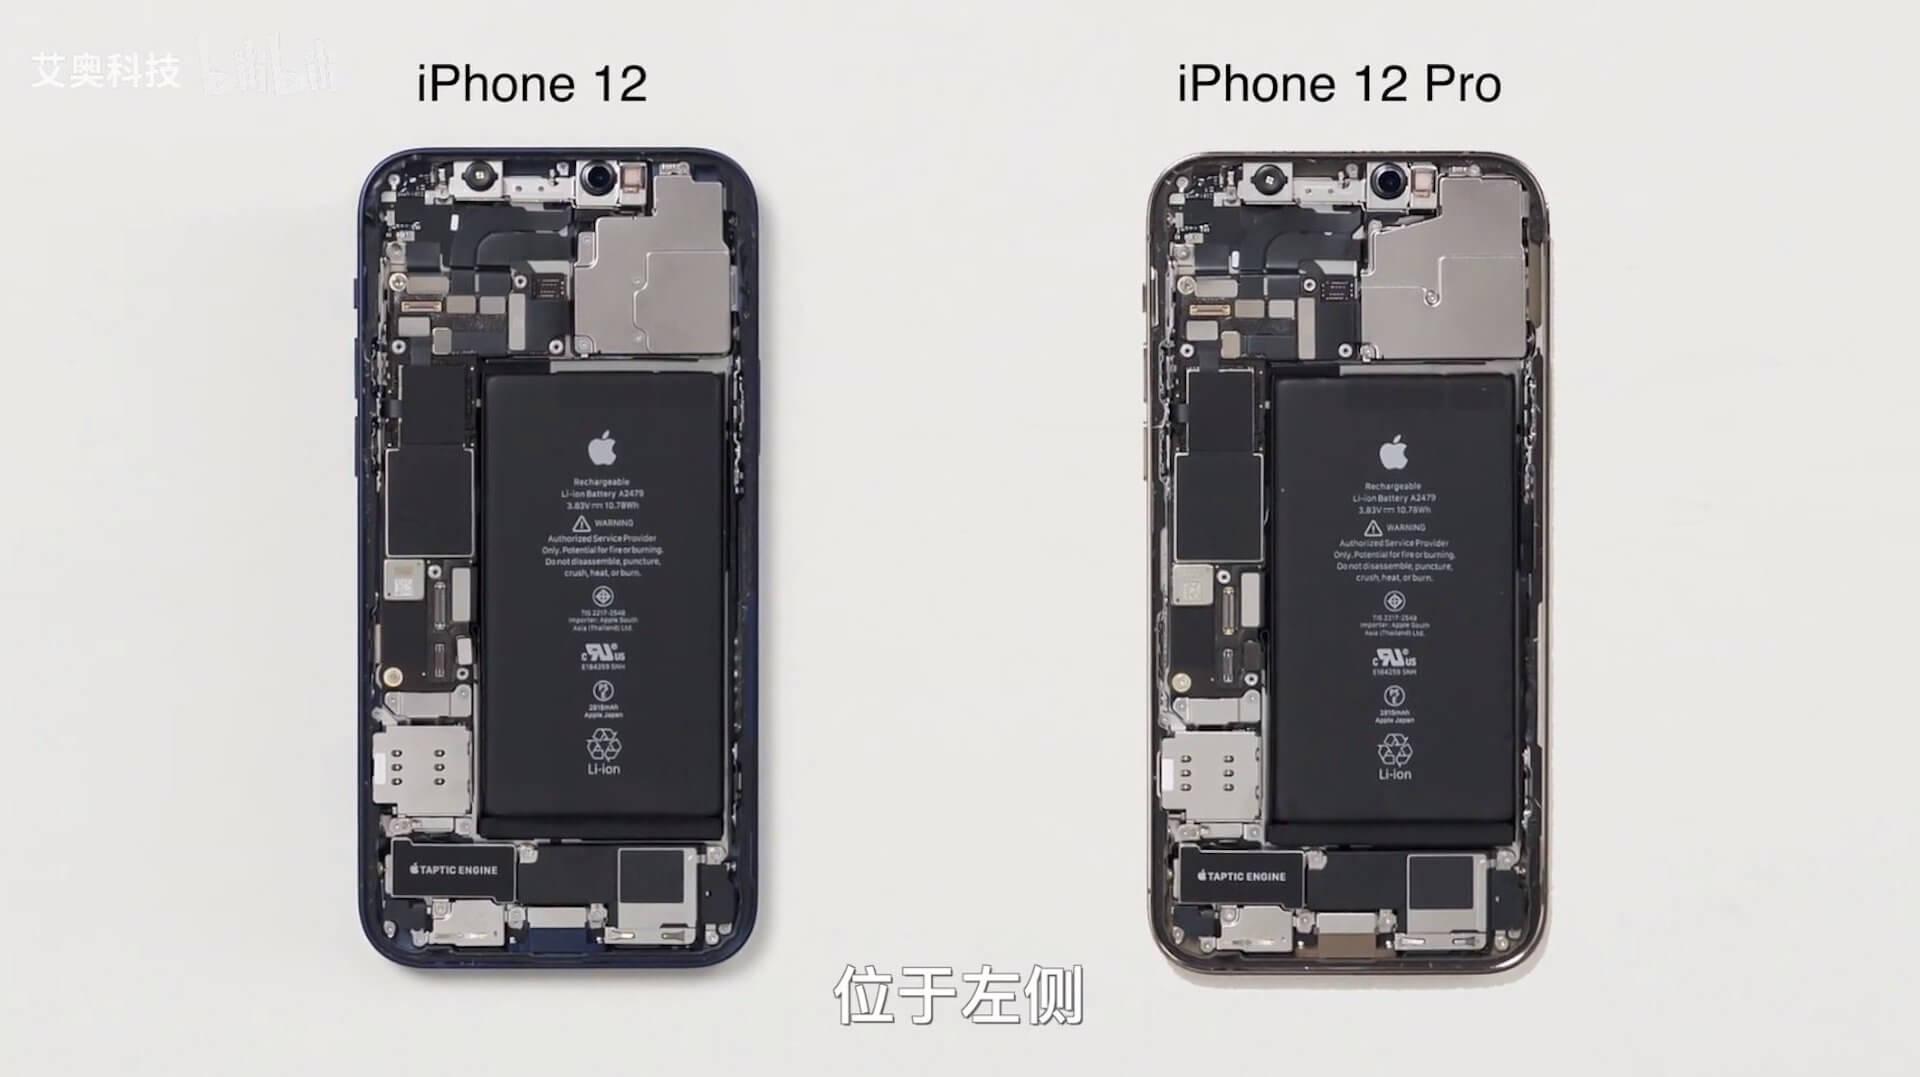 iPhone 12とiPhone 12 Proのバッテリーは全く同じ容量?分解動画が話題 tech201023_iphone12_1